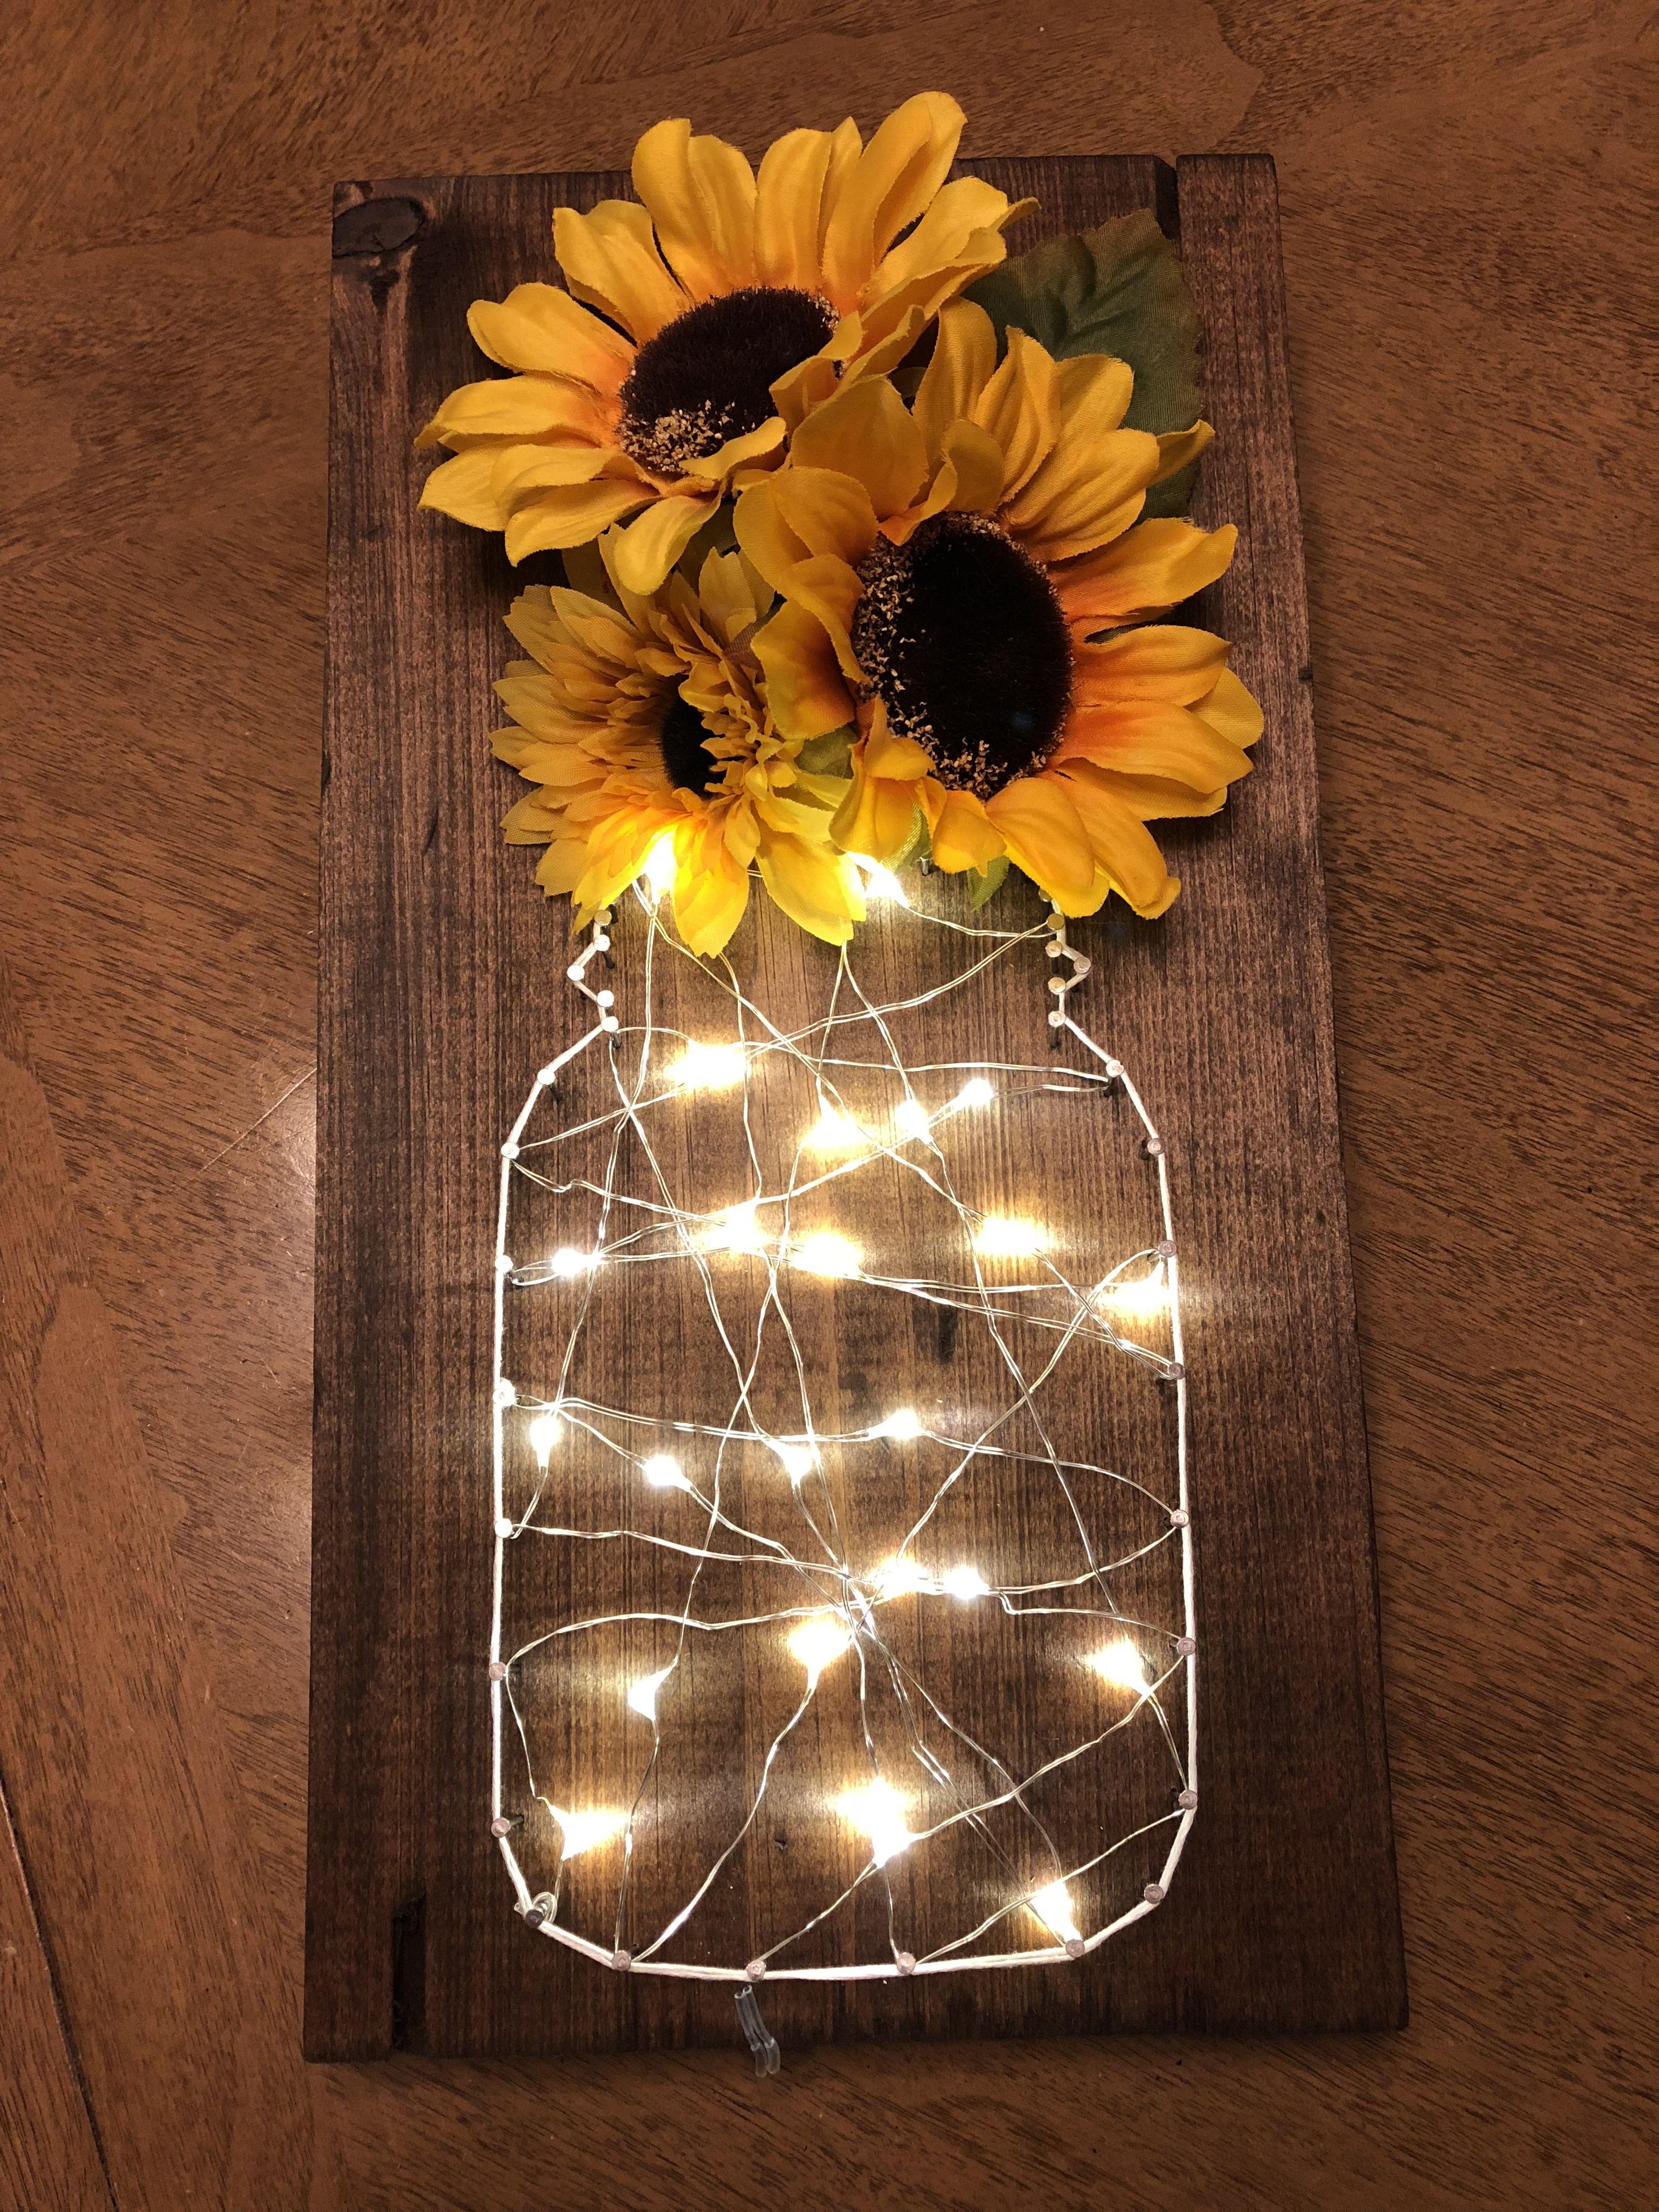 Sunflower Fairy Light Sting Art Diy Home Decor Room